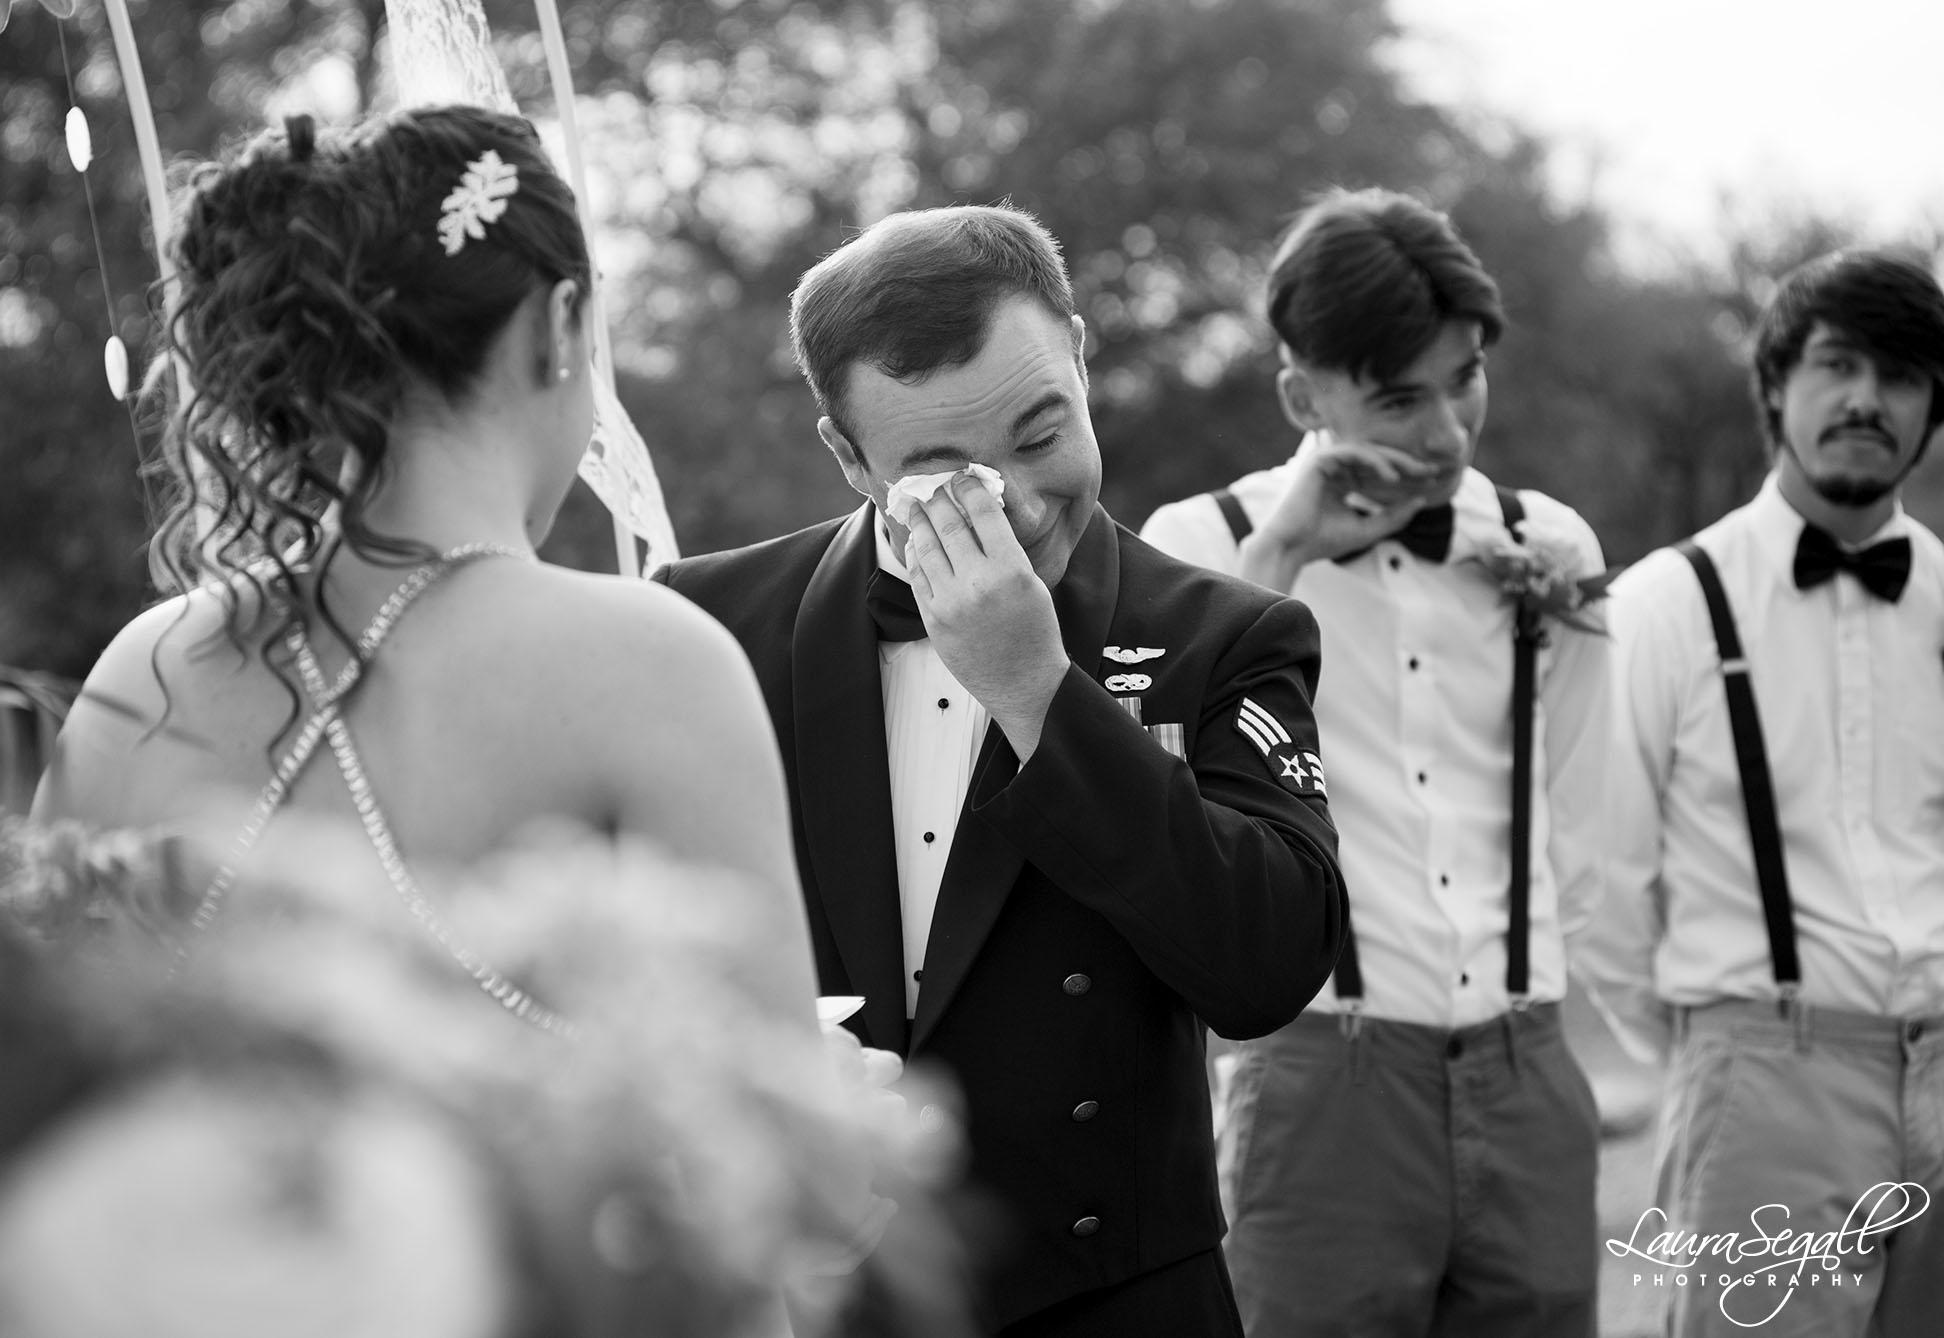 New River, Arizona wedding